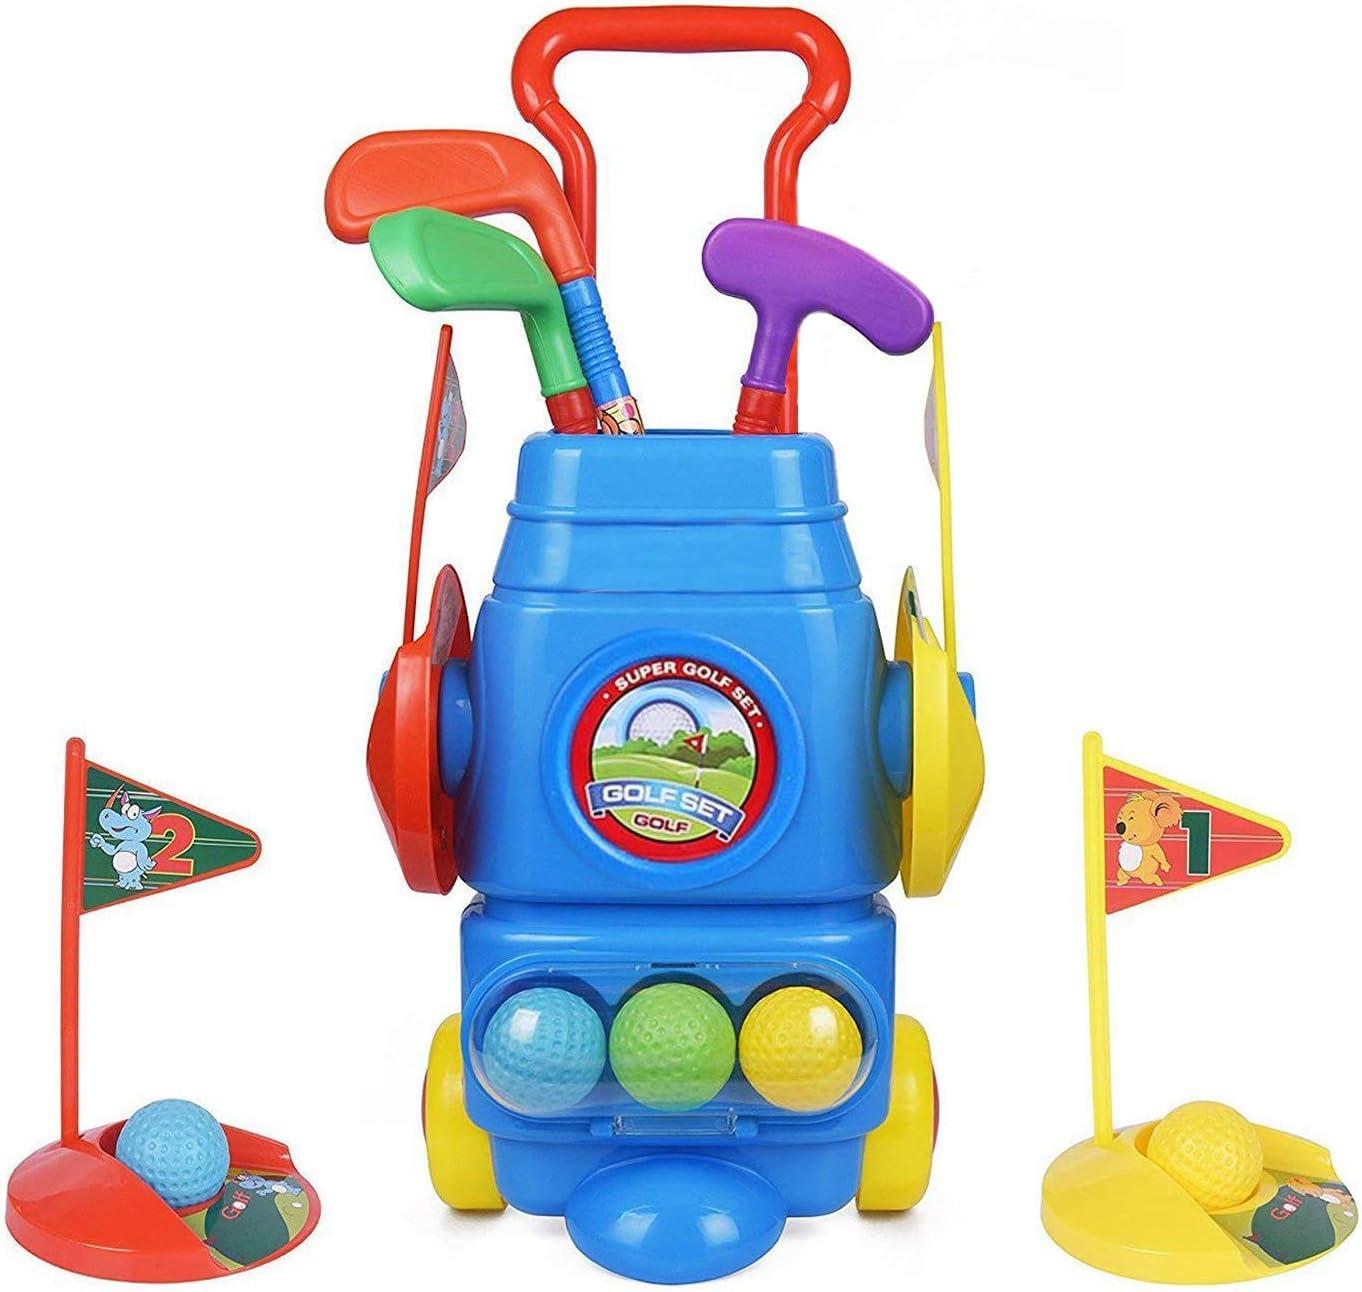 ToyVelt Kids Golf Club Set – Golf CartWith Wheels, 3 Colorful Golf Sticks, 3 Balls & 2 Practice Holes